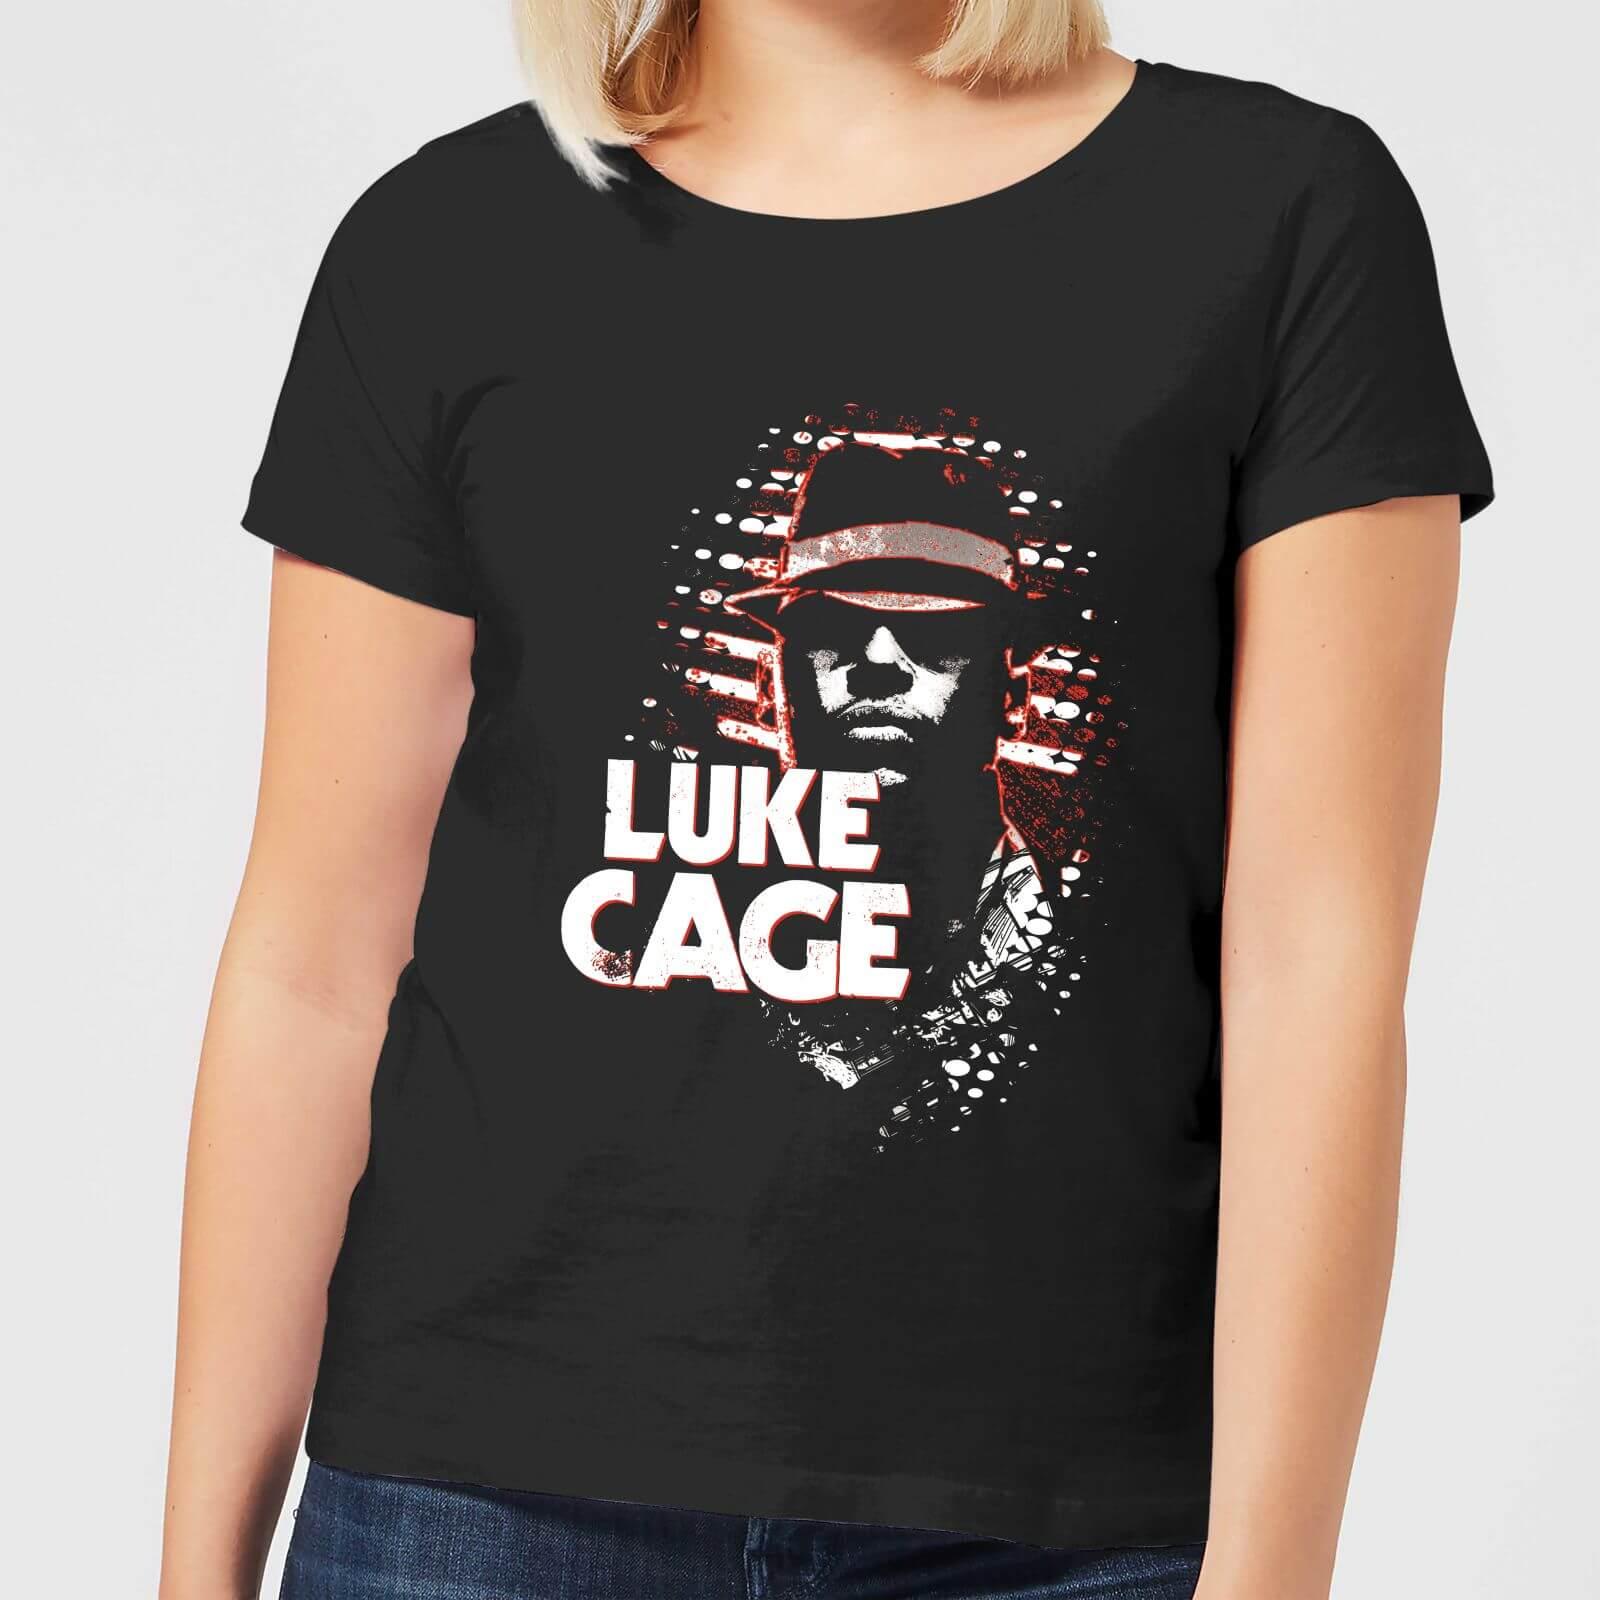 OfferteWeb.click 42-t-shirt-marvel-knights-luke-cage-nero-donna-m-nero